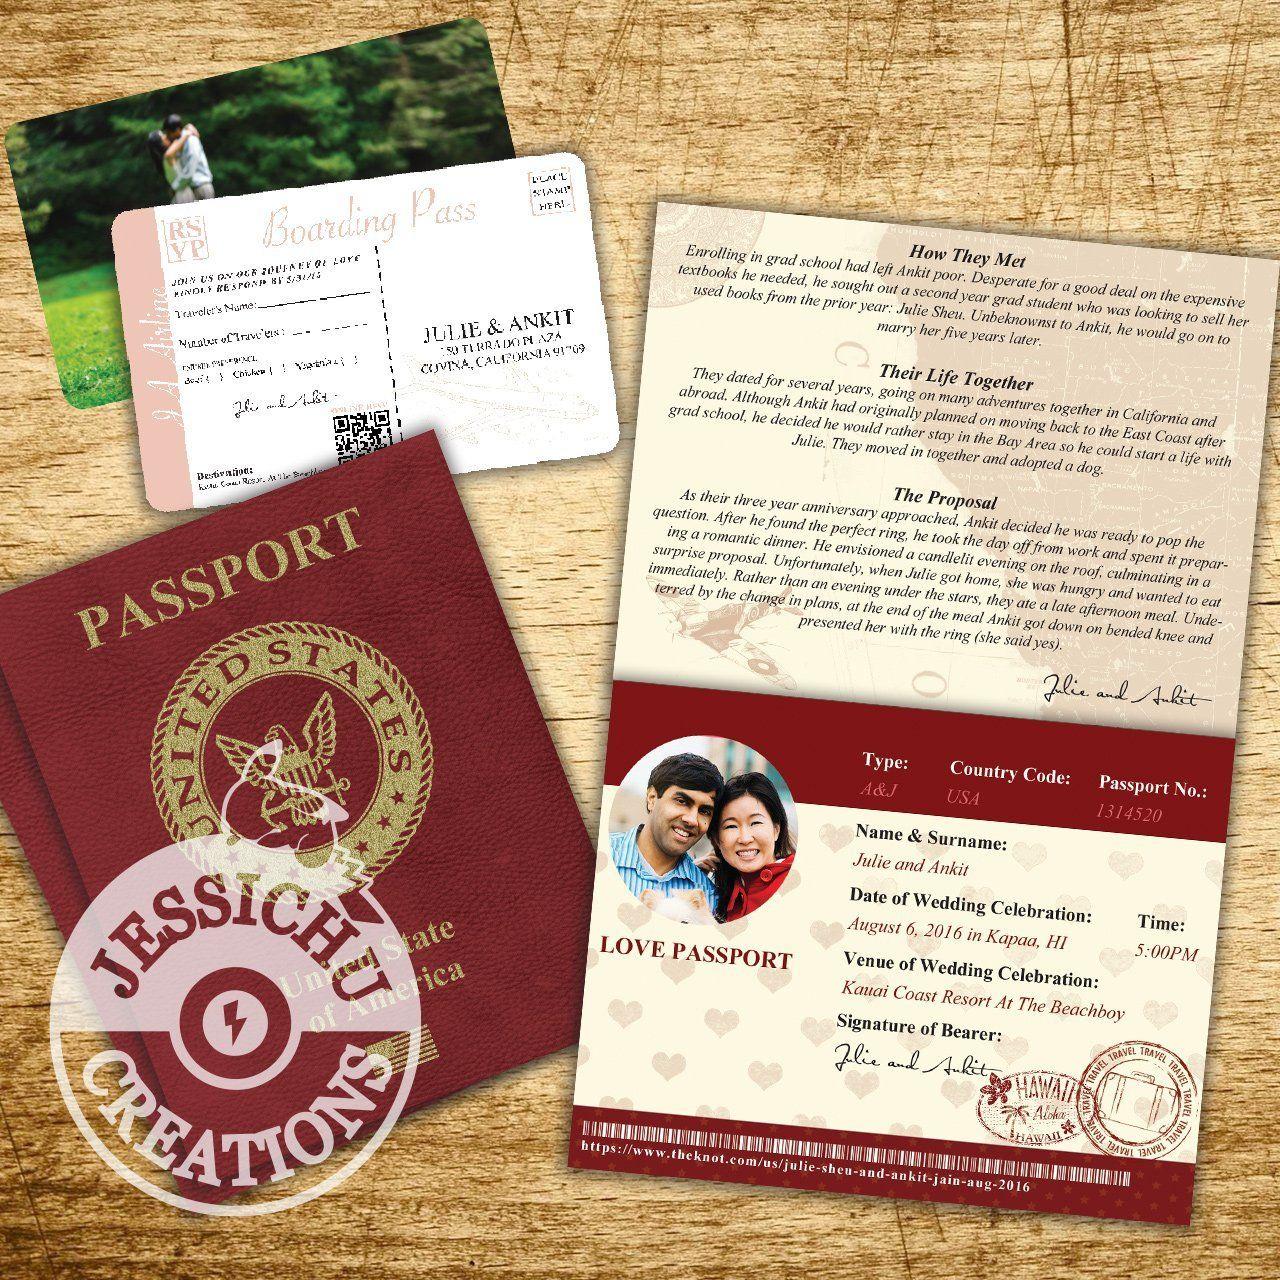 Passport & Ticket Wedding Invitation, Programs, Save the Date ...